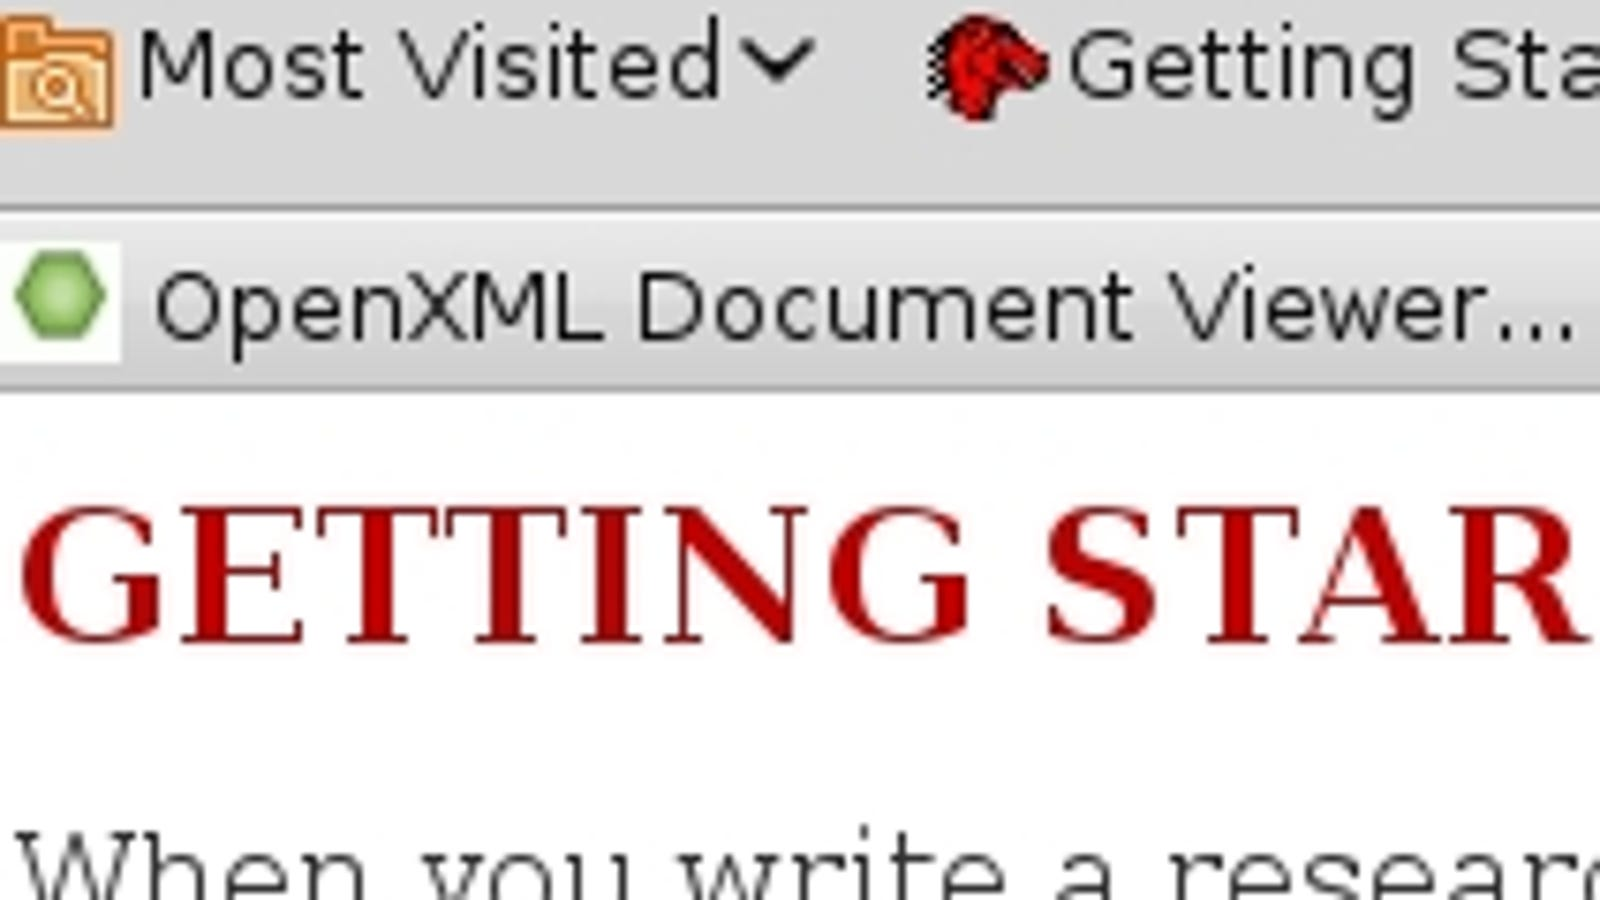 OpenXML Document Viewer Opens Office 2007 Files in Firefox